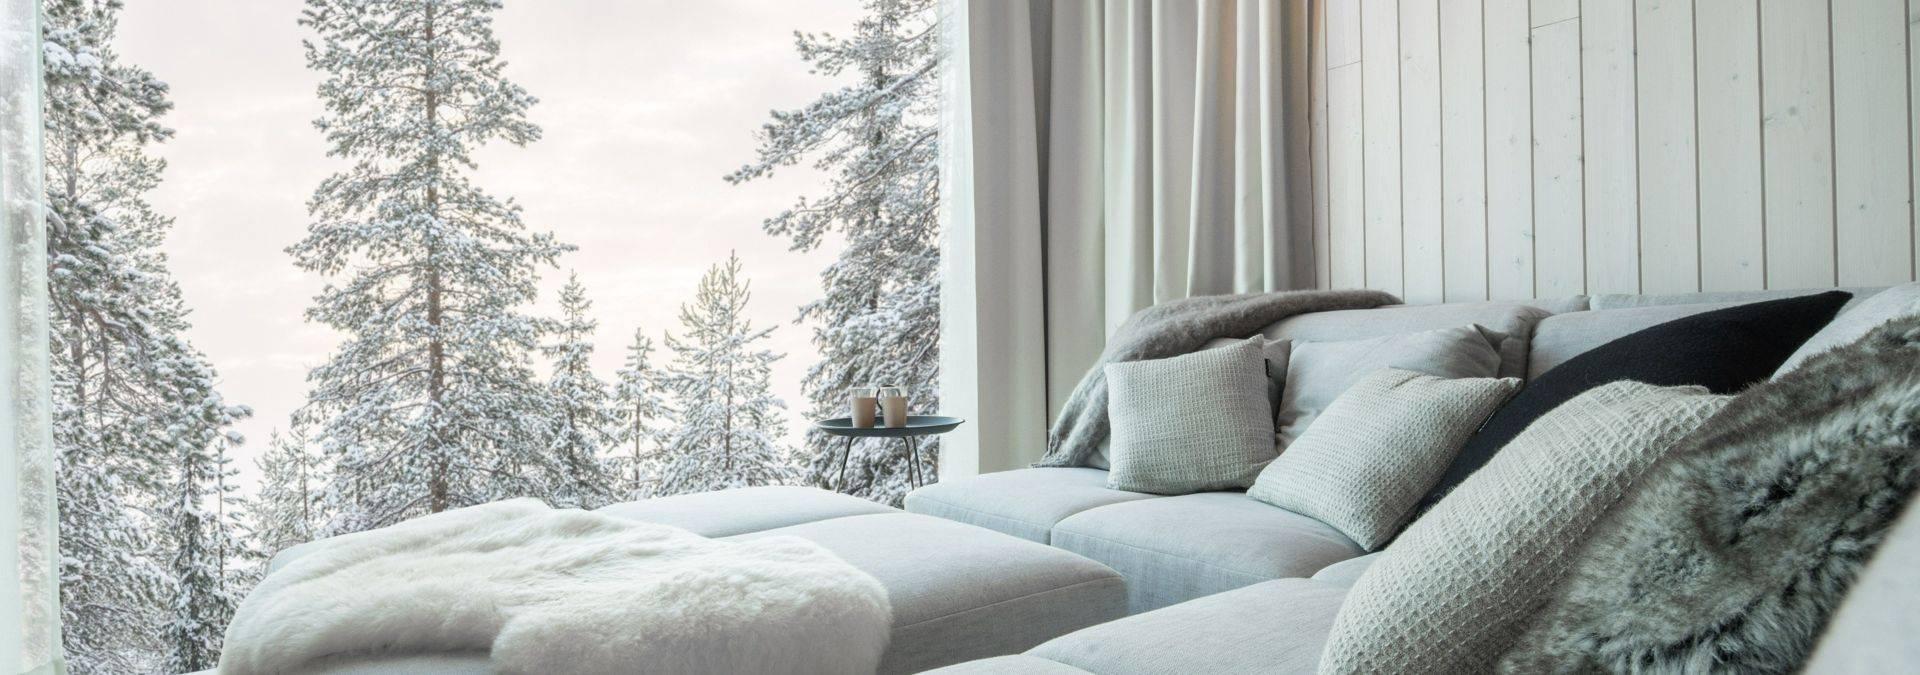 ArcticScene Executive Suite   1 Credit Arctic TreeHouse Hotel